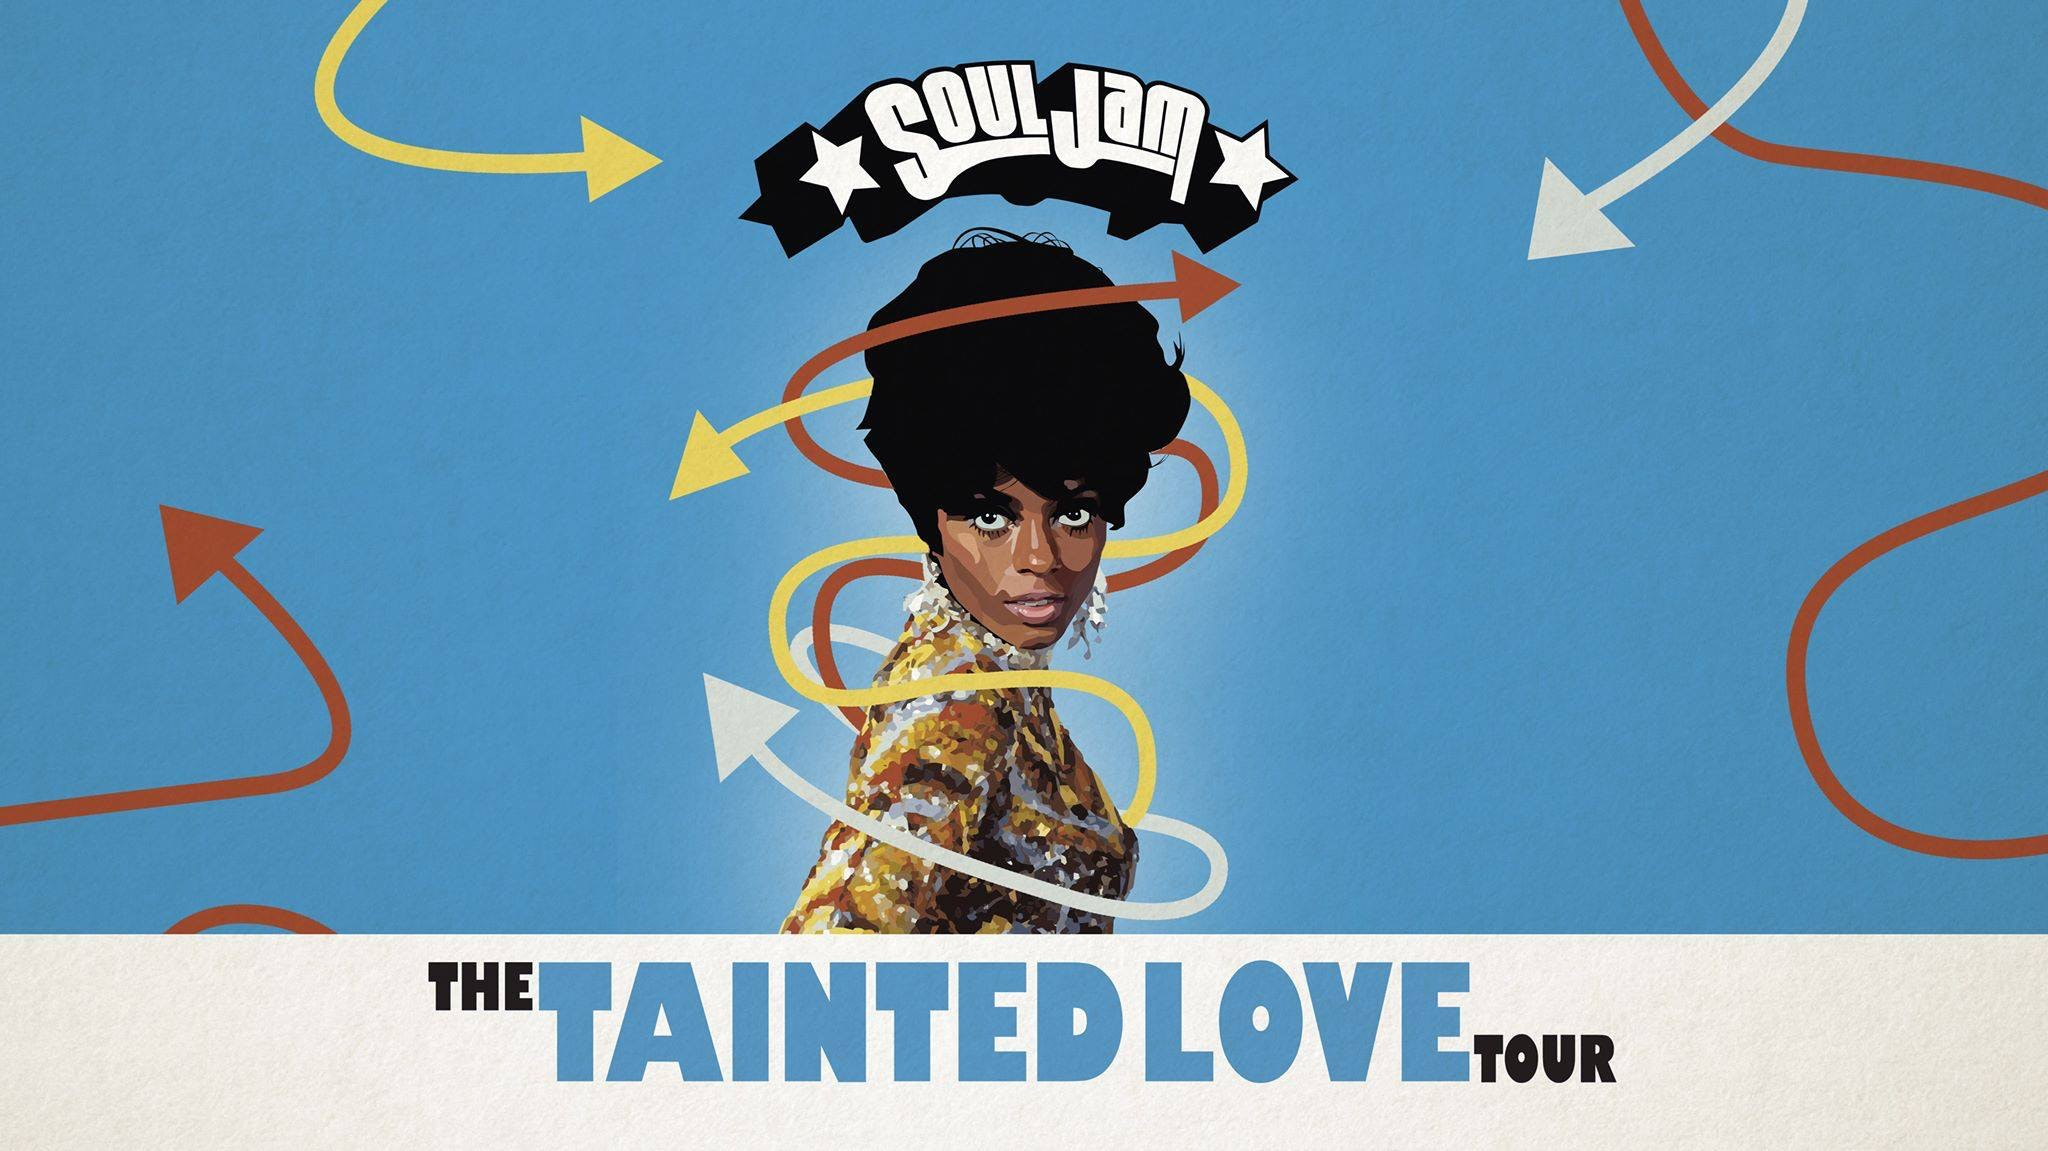 SoulJam / The Tainted Love Tour